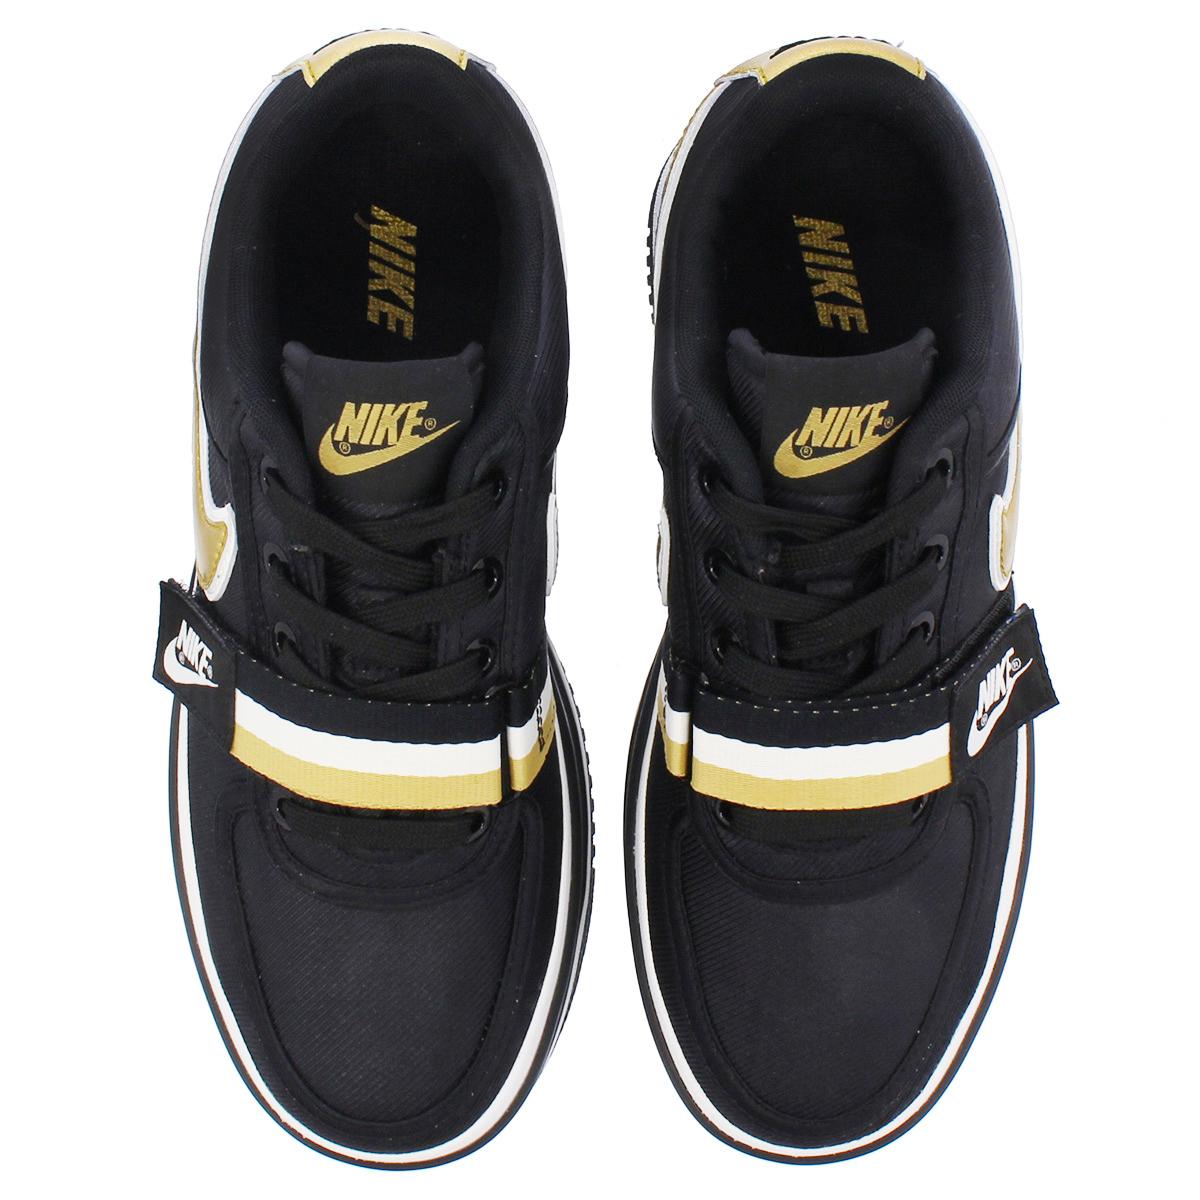 17aa7267038 NIKE WMNS VANDAL 2K Nike women Vandal 2K BLACK METALLIC GOLD ao2868-002